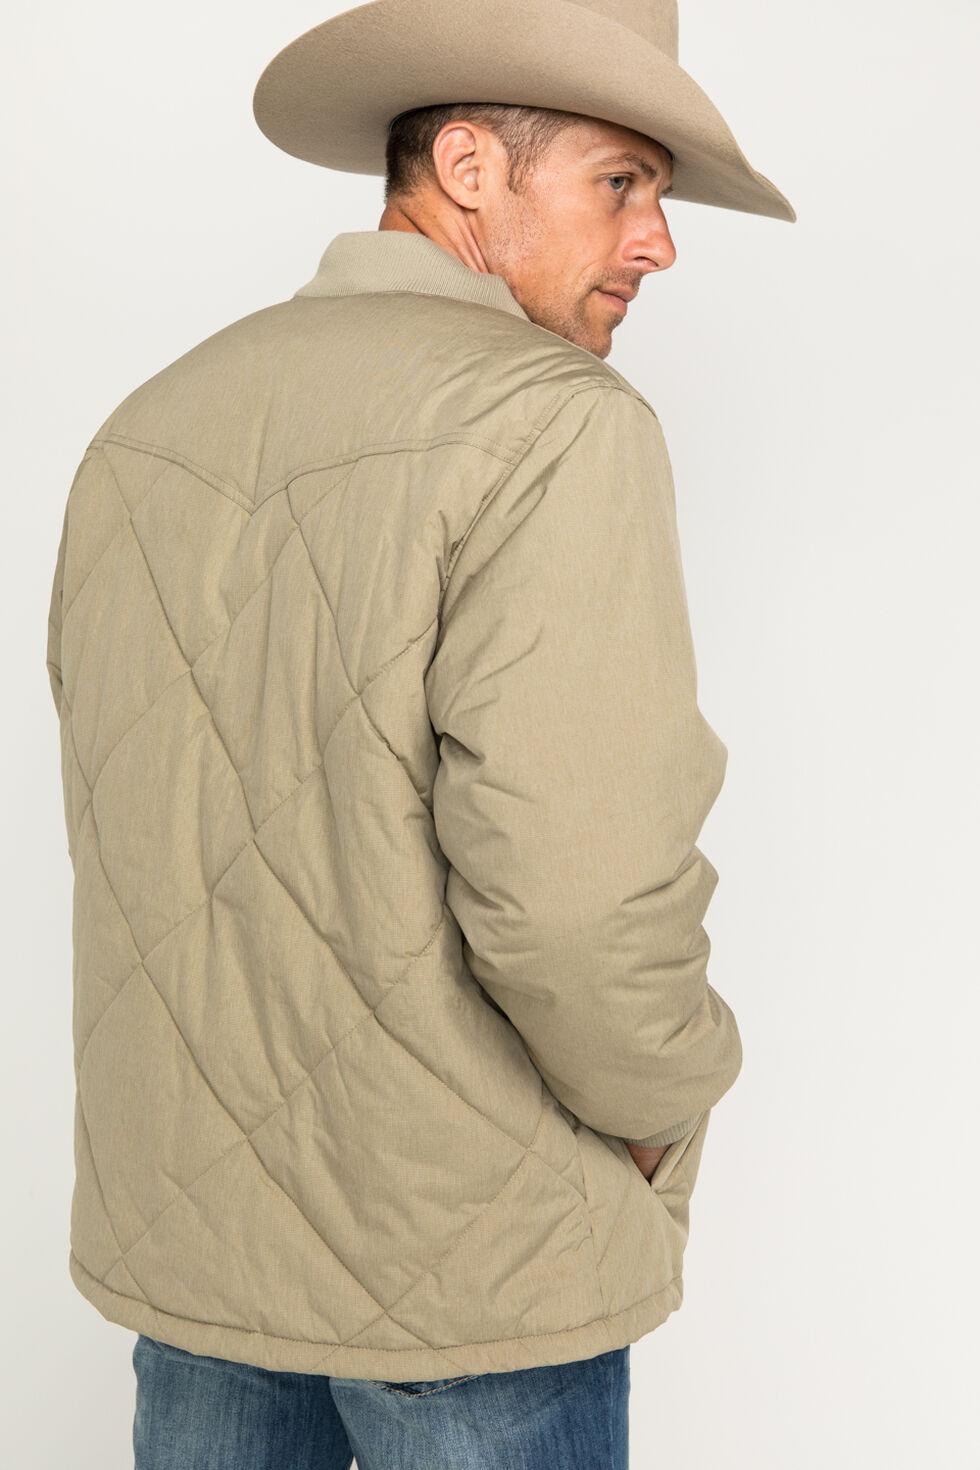 Cody James Men's Quilted Insulation Jacket, Khaki, hi-res